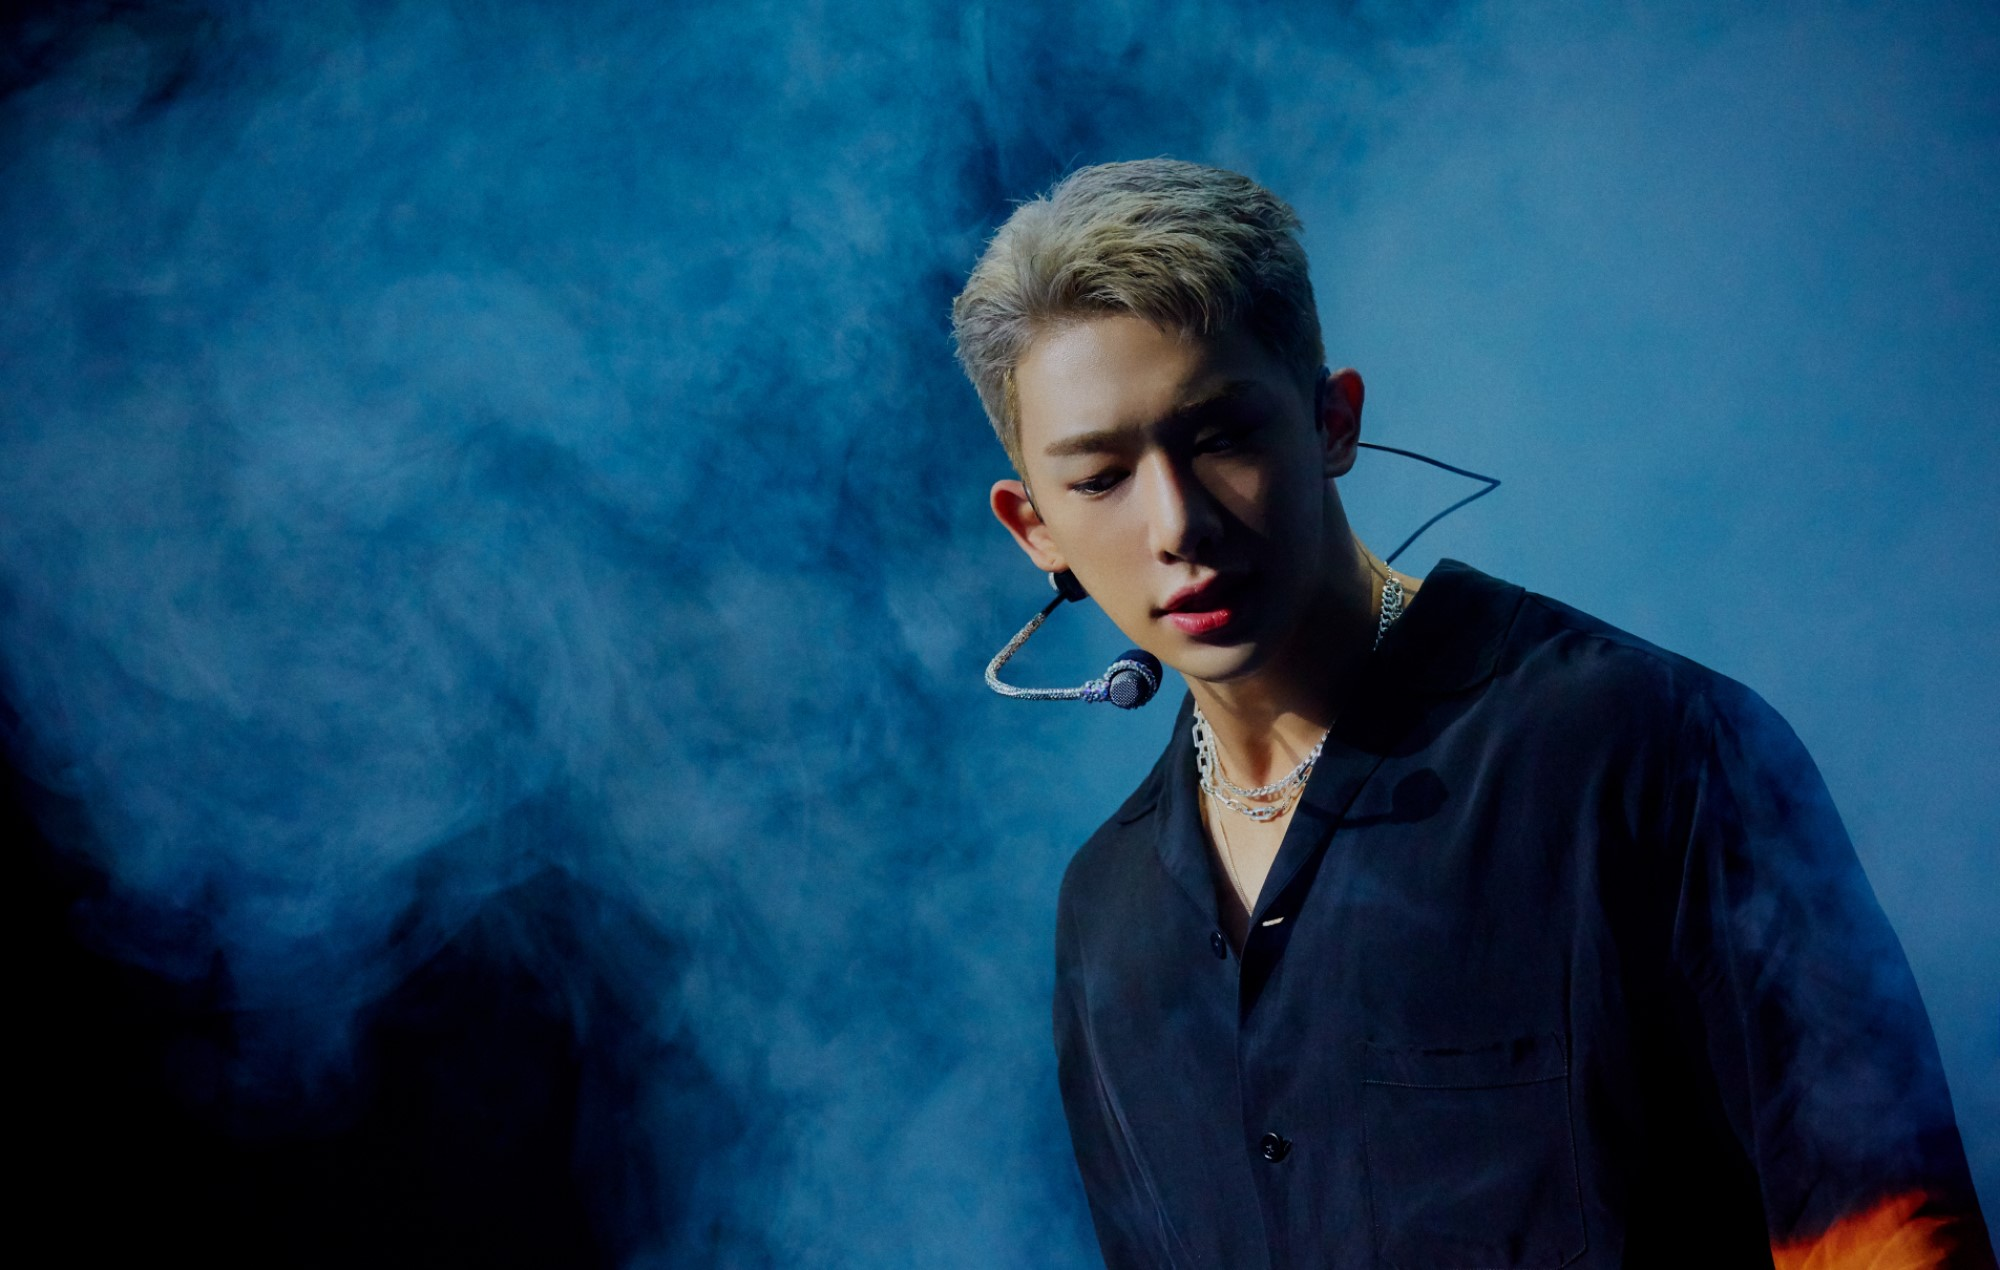 wonho concert live review